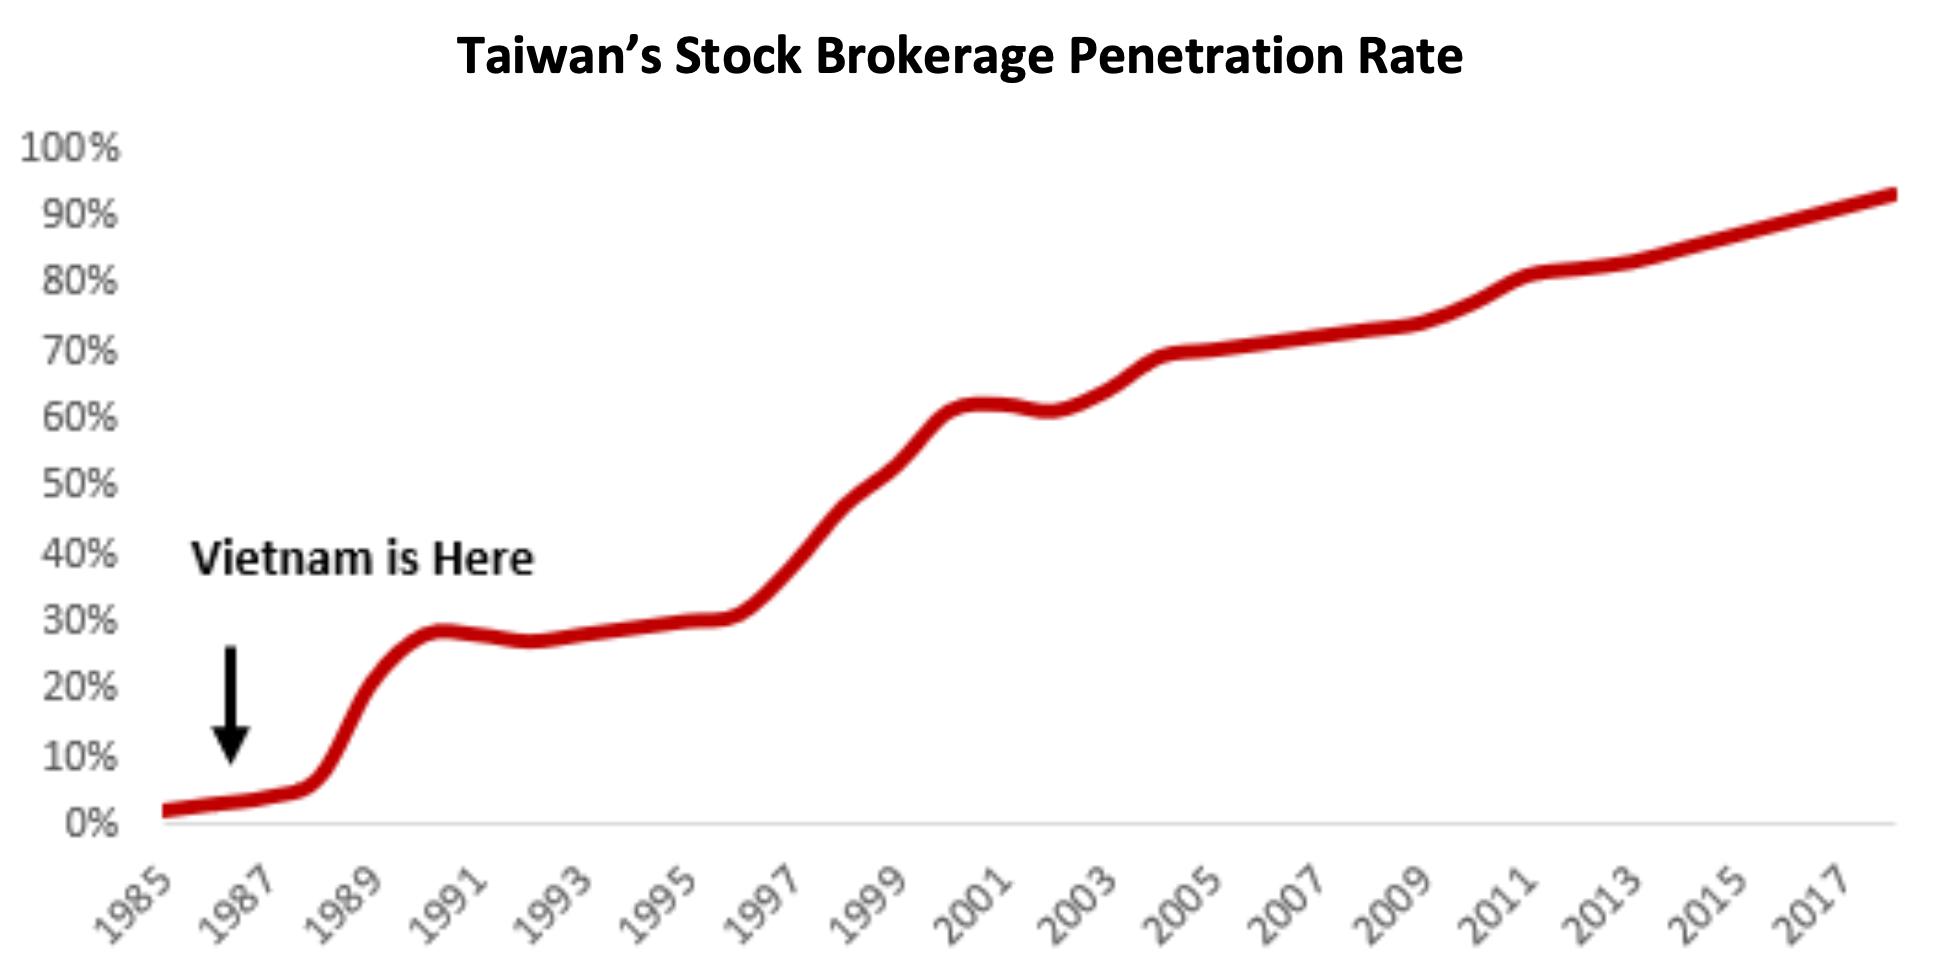 Source: Yuanta Securities via VinaCapital.